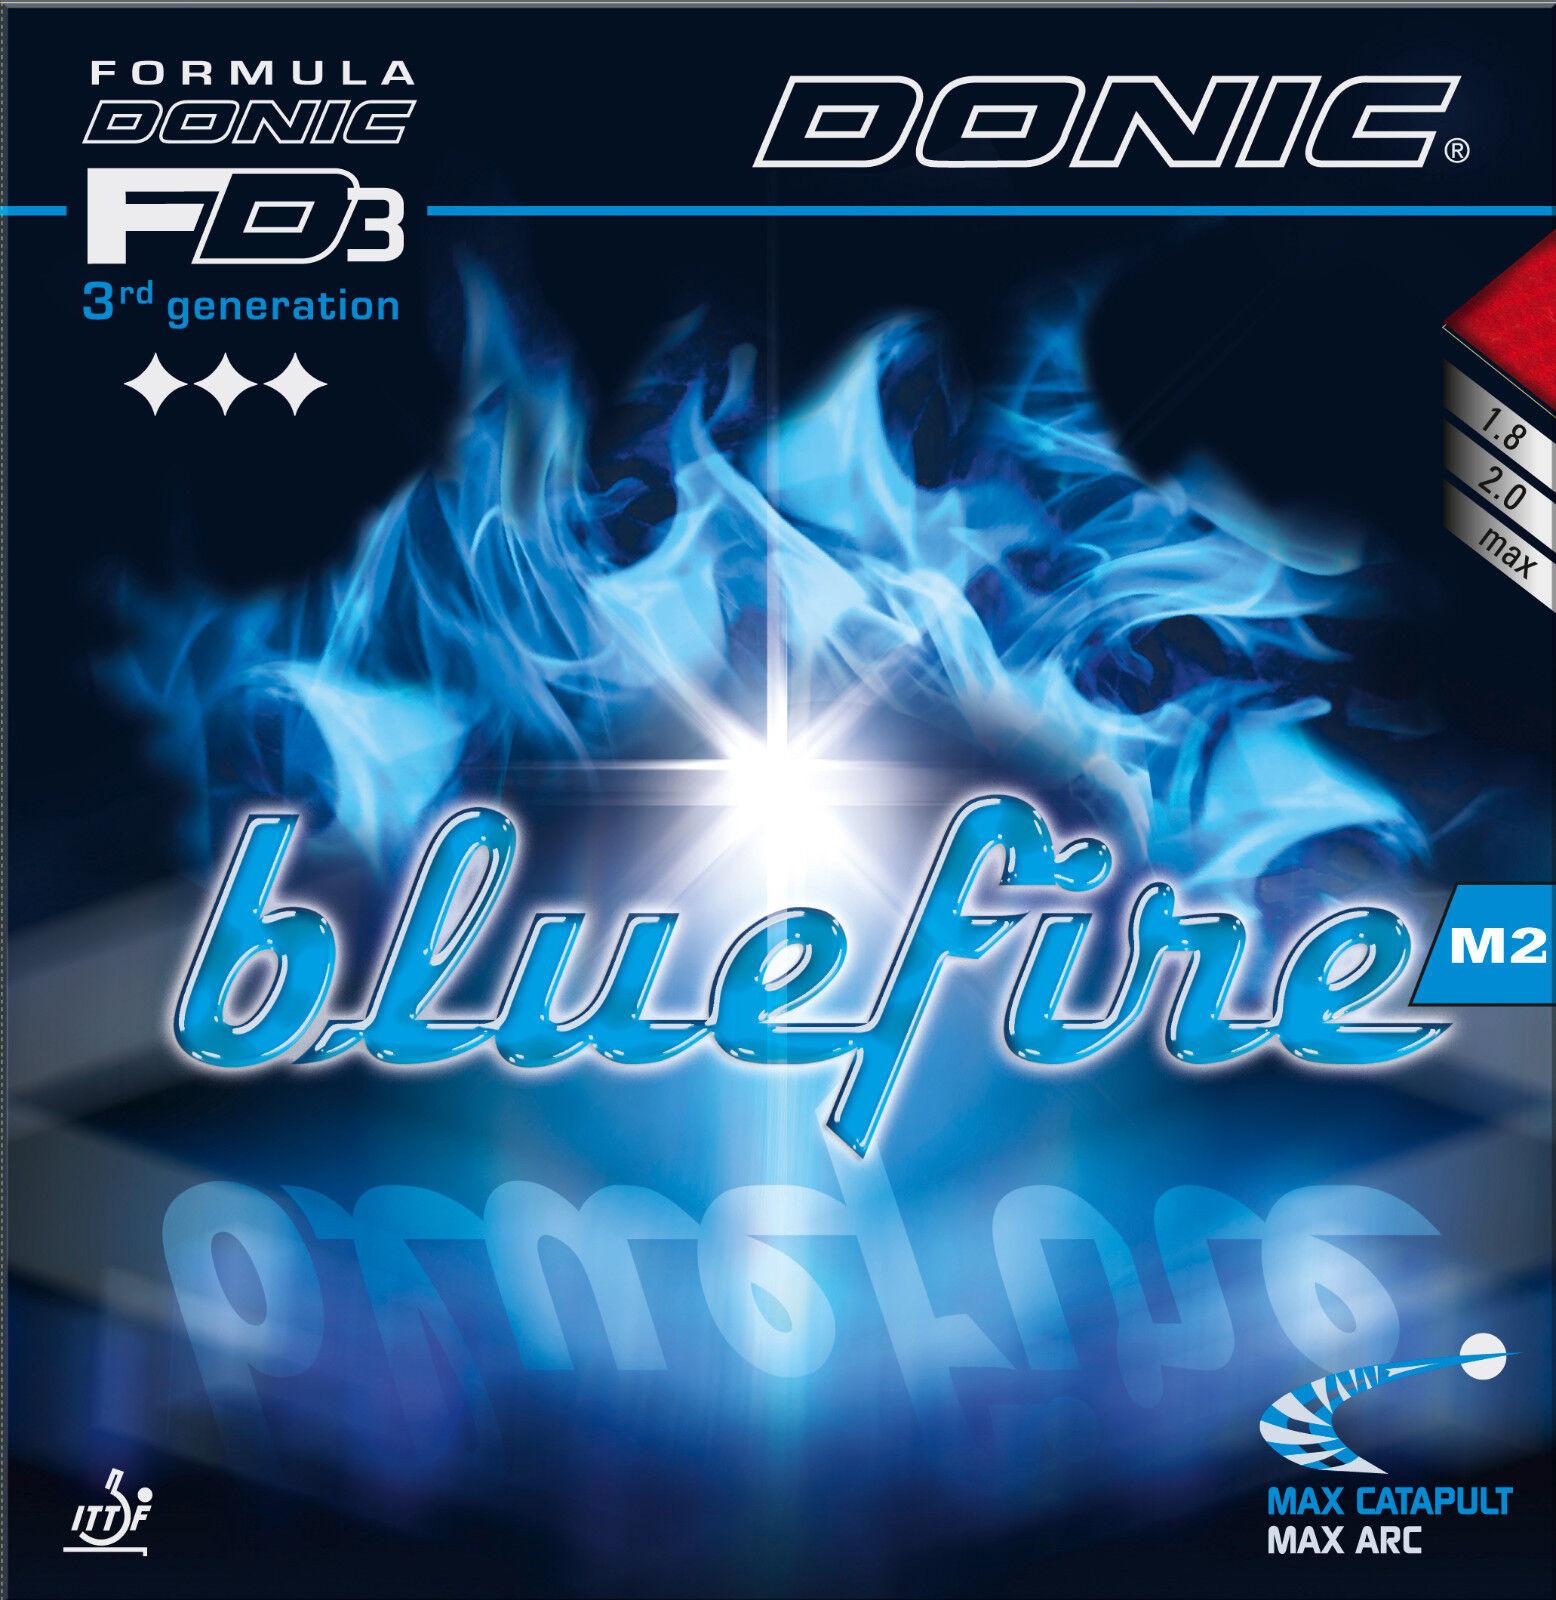 DONIC Blaufire M2 max rot  NEU   OVP OVP OVP 4dbd5c